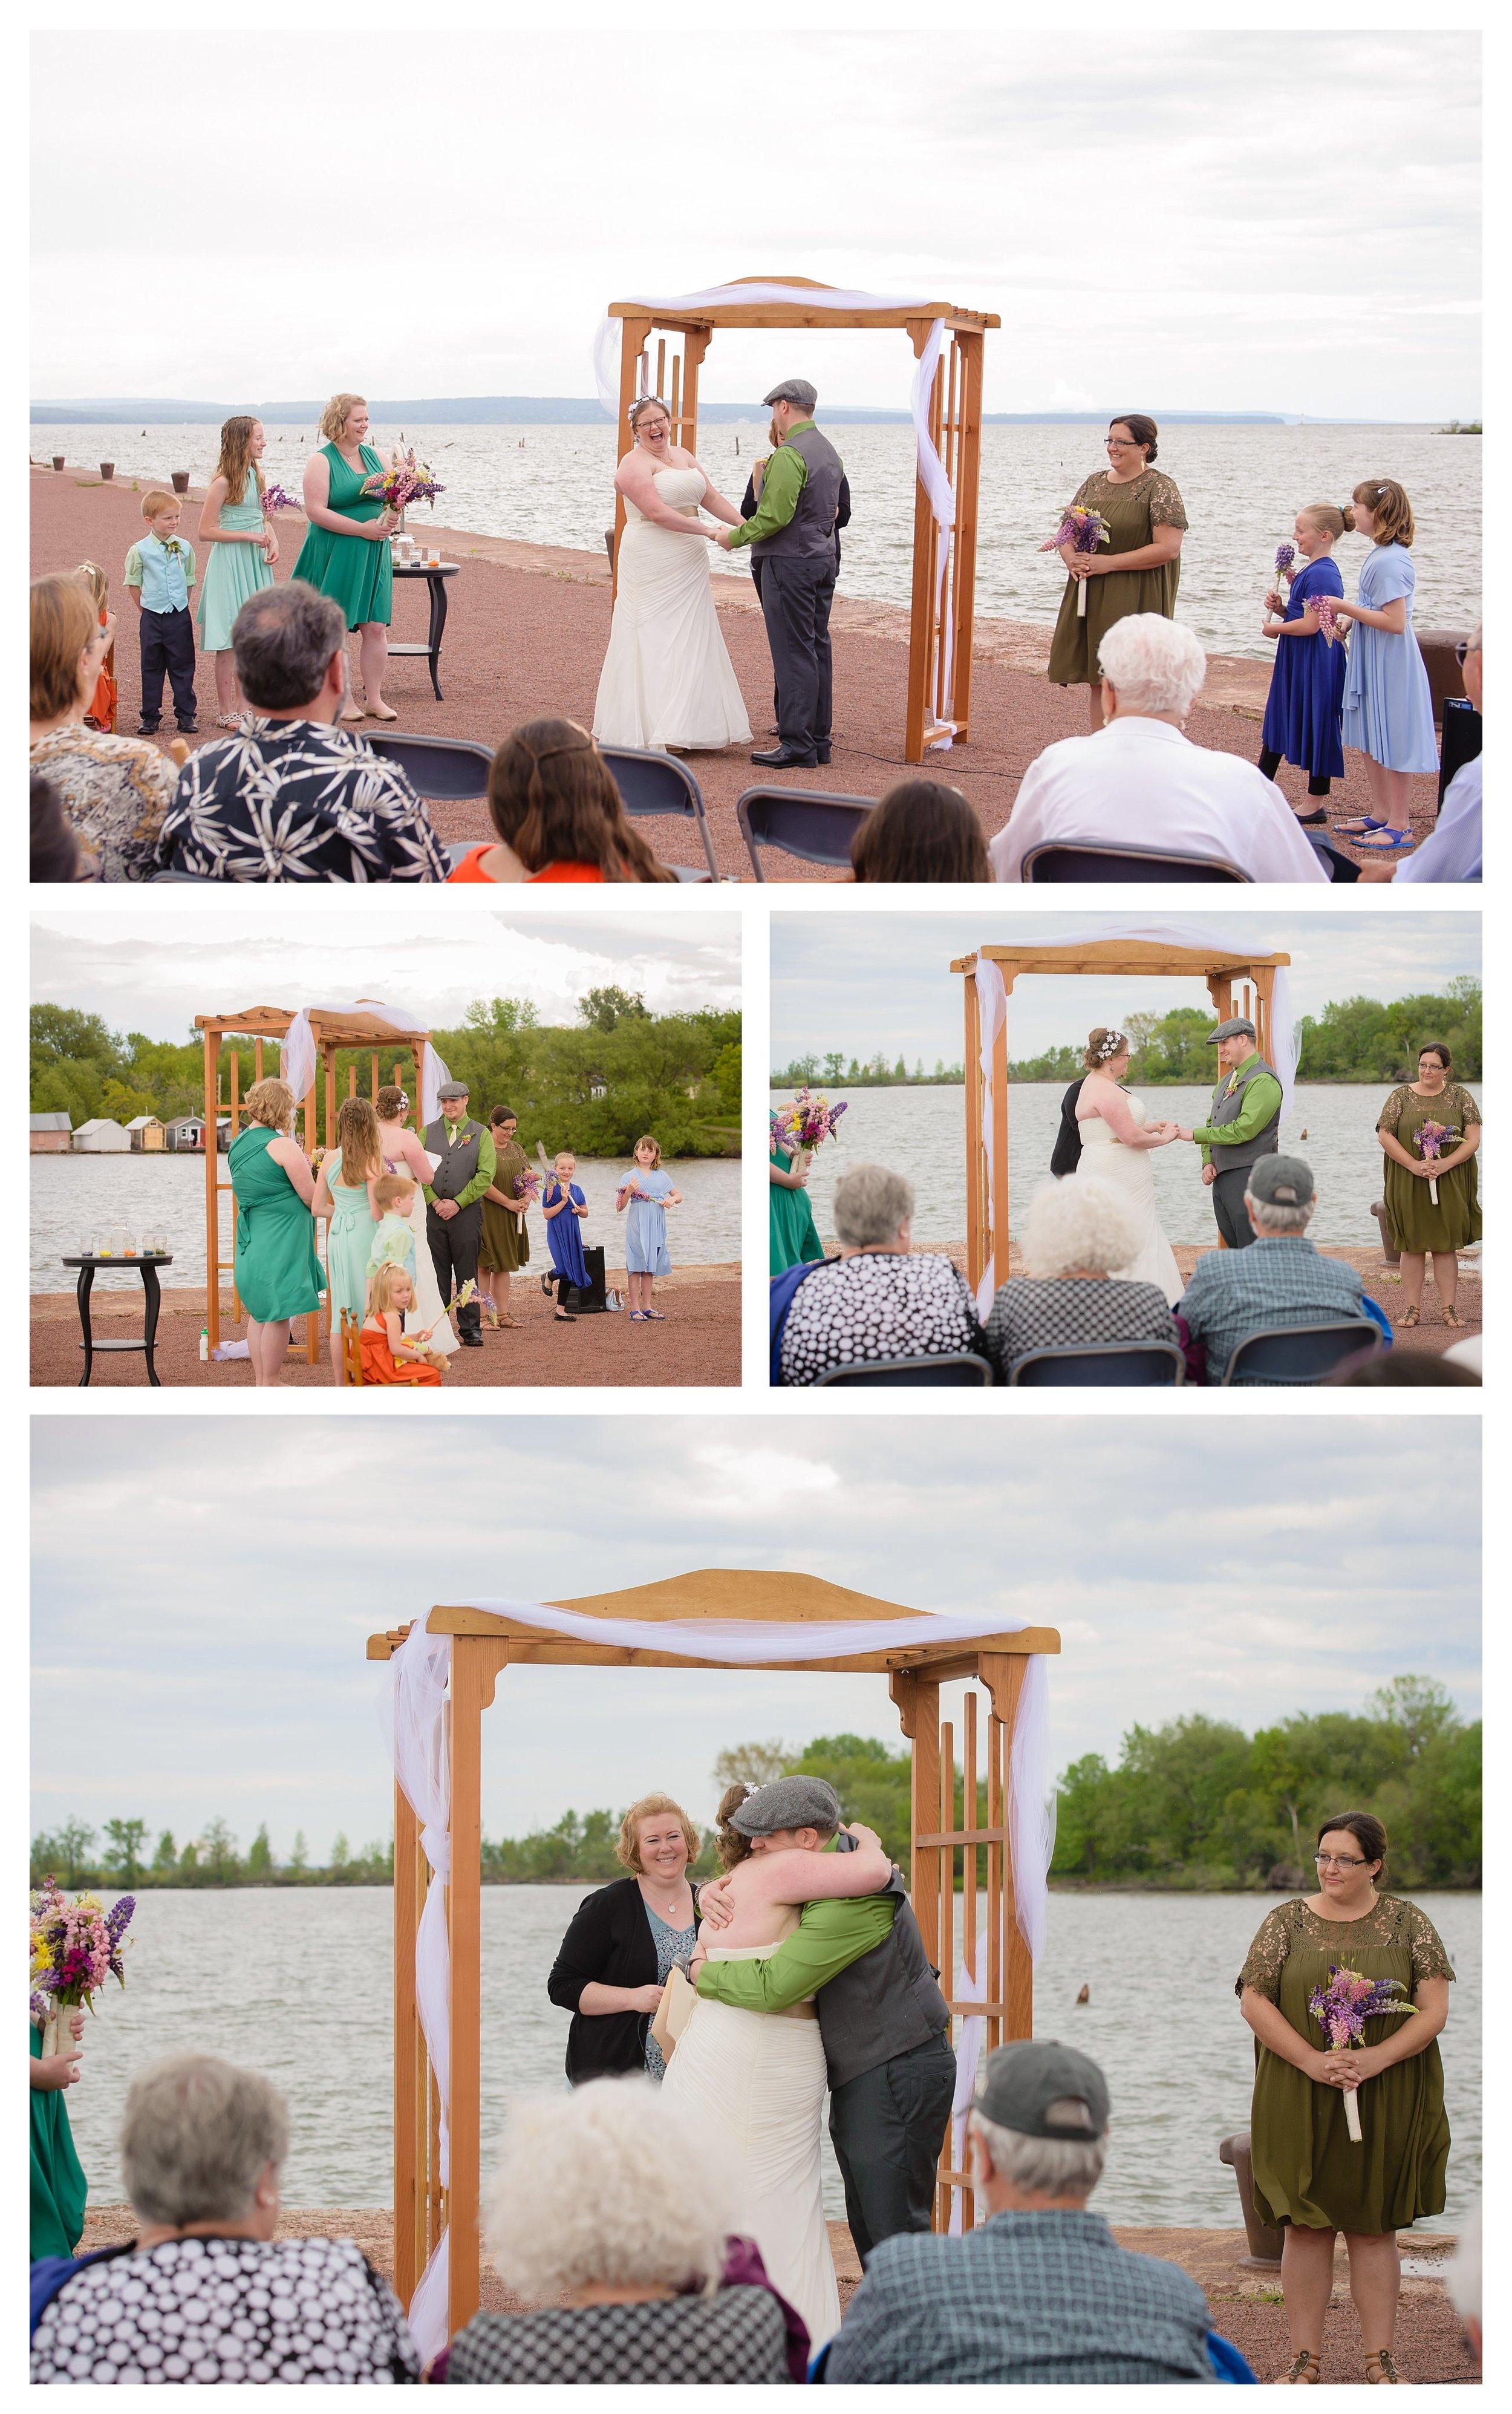 ashland oredock northwoods wisconsin wedding ps 139 photography_0285.jpg